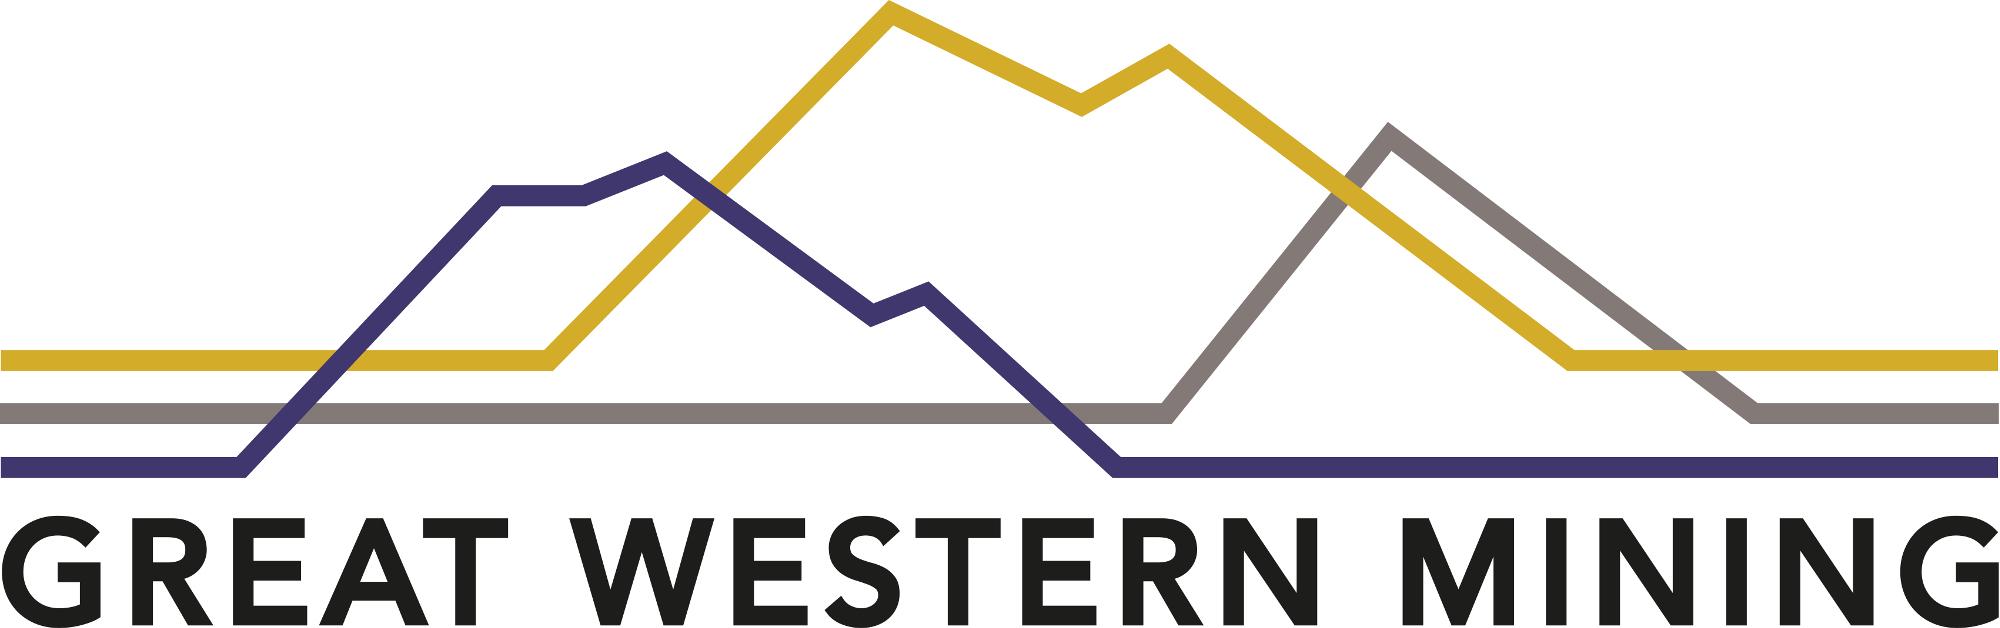 GREAT WESTERN MINING CORPORATION PLC Logo